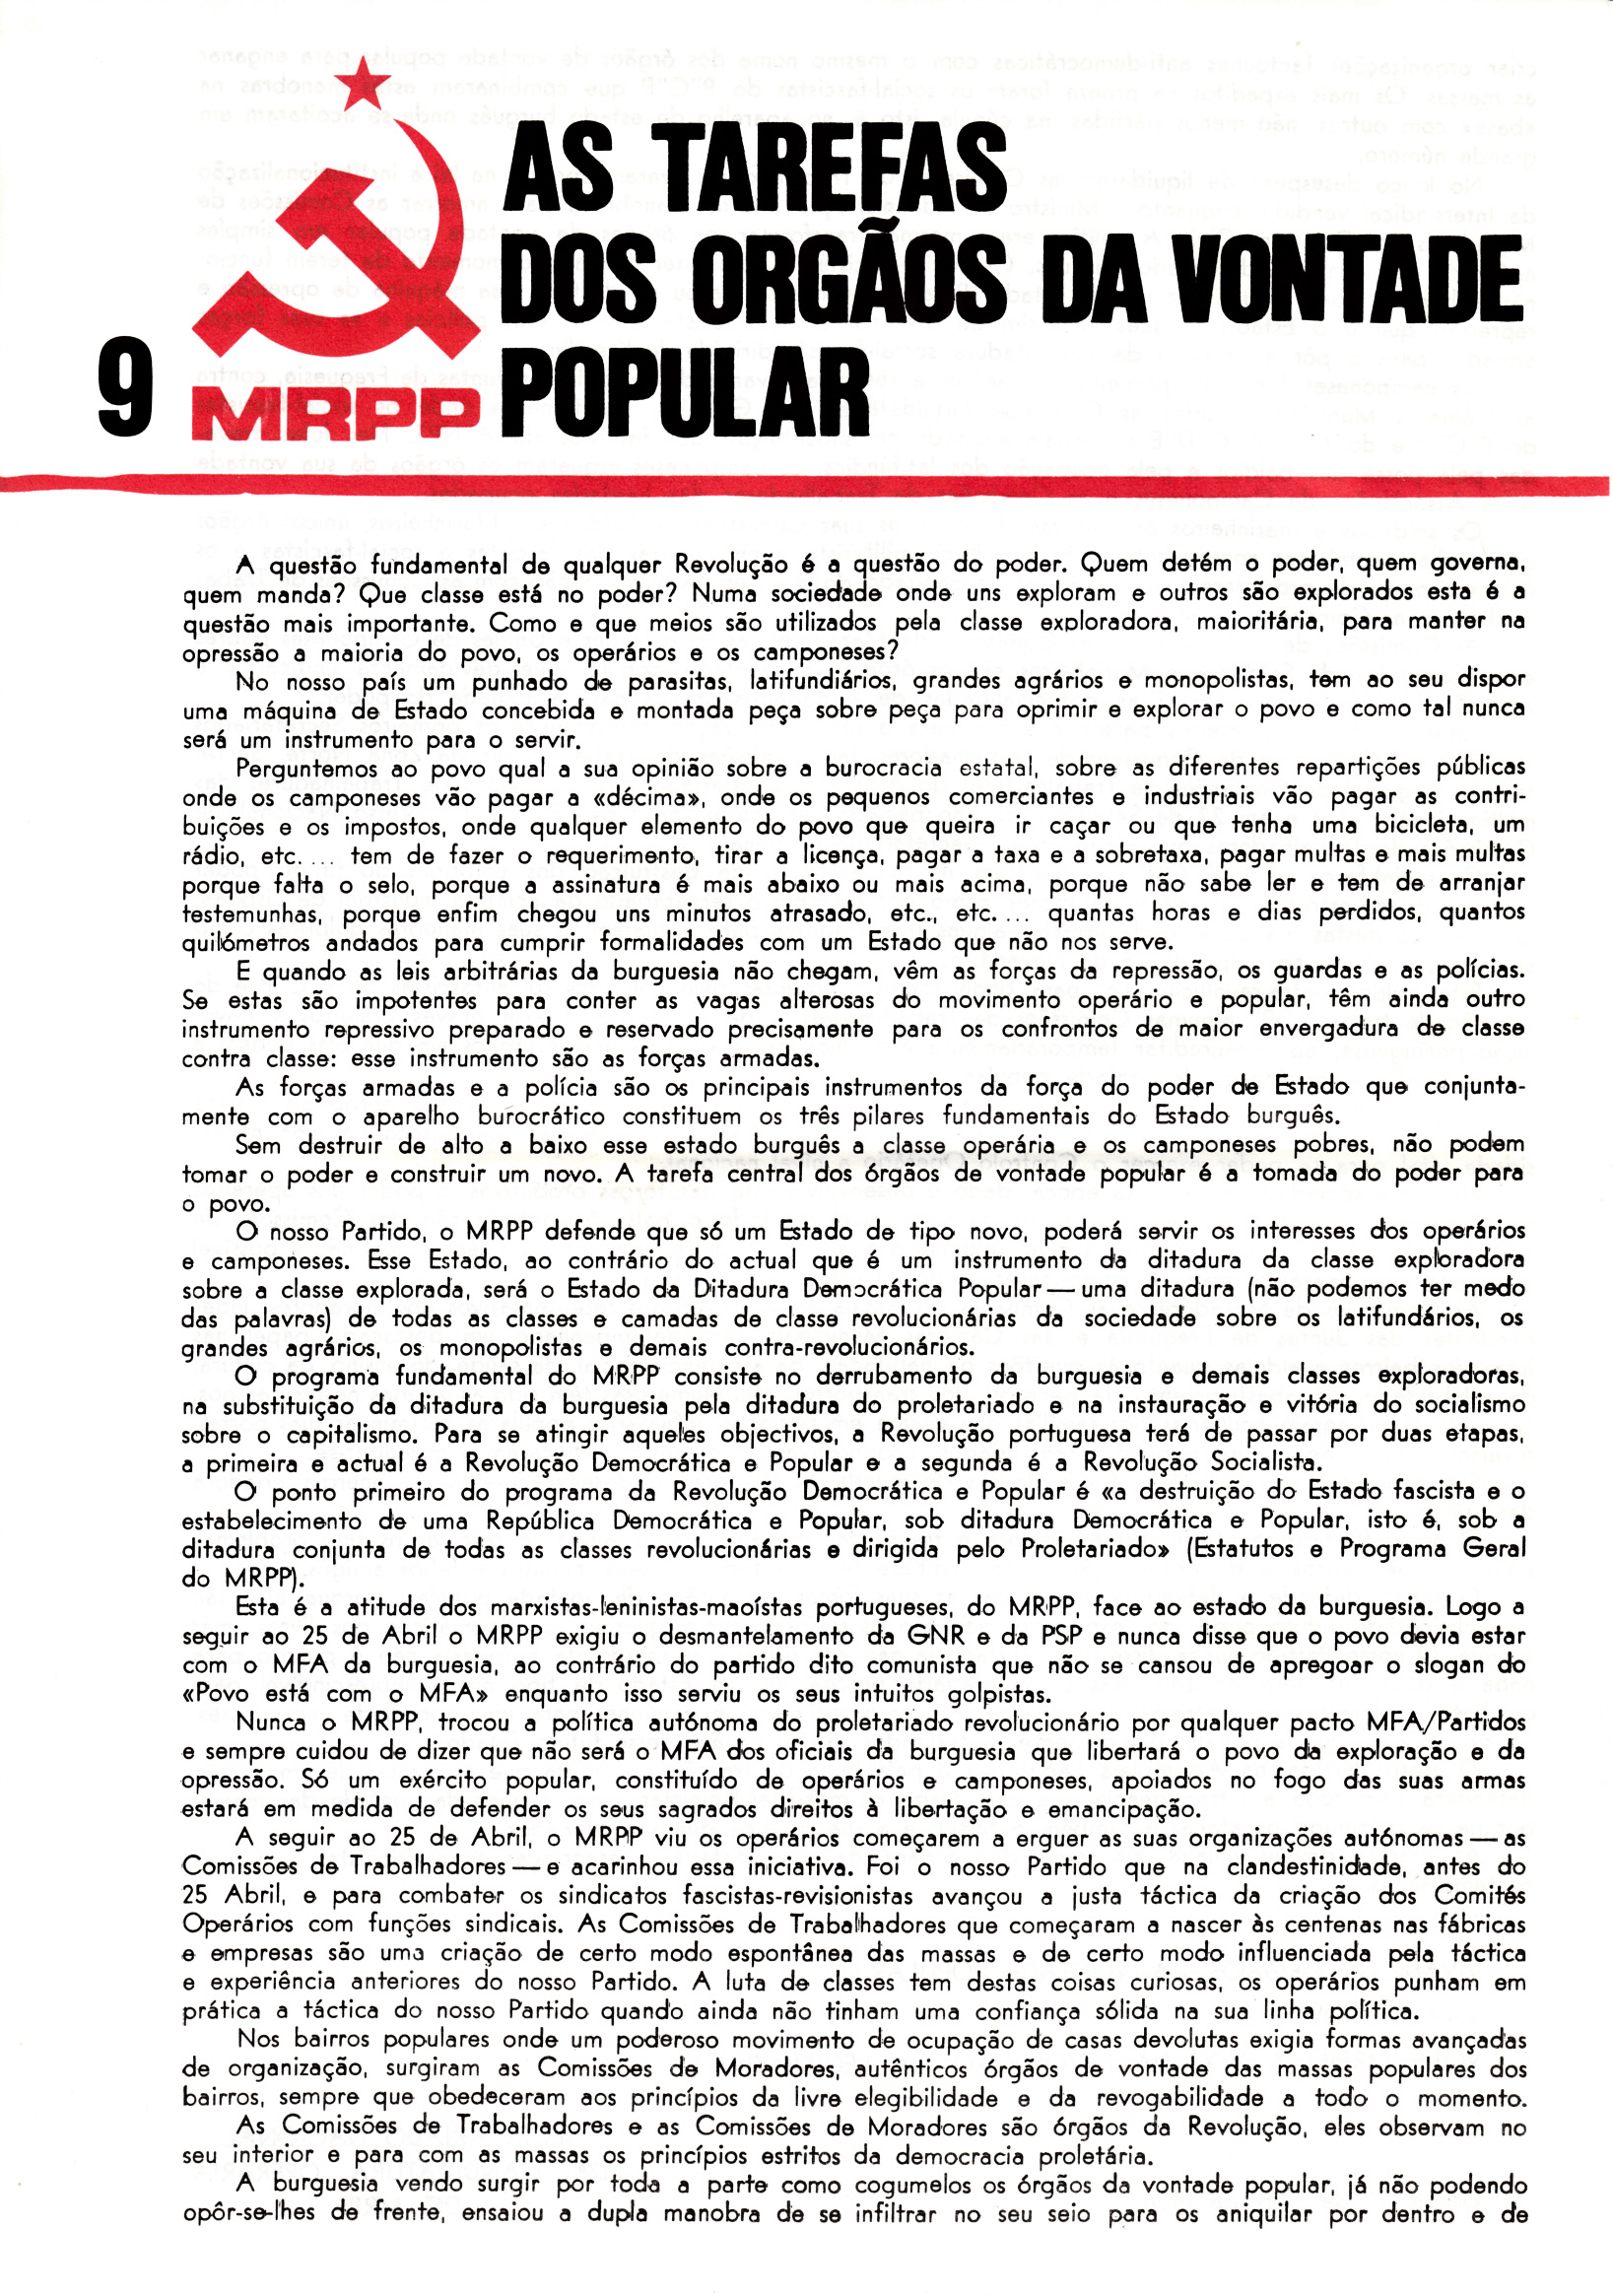 mrpp_1976_eleicao_programa_0017